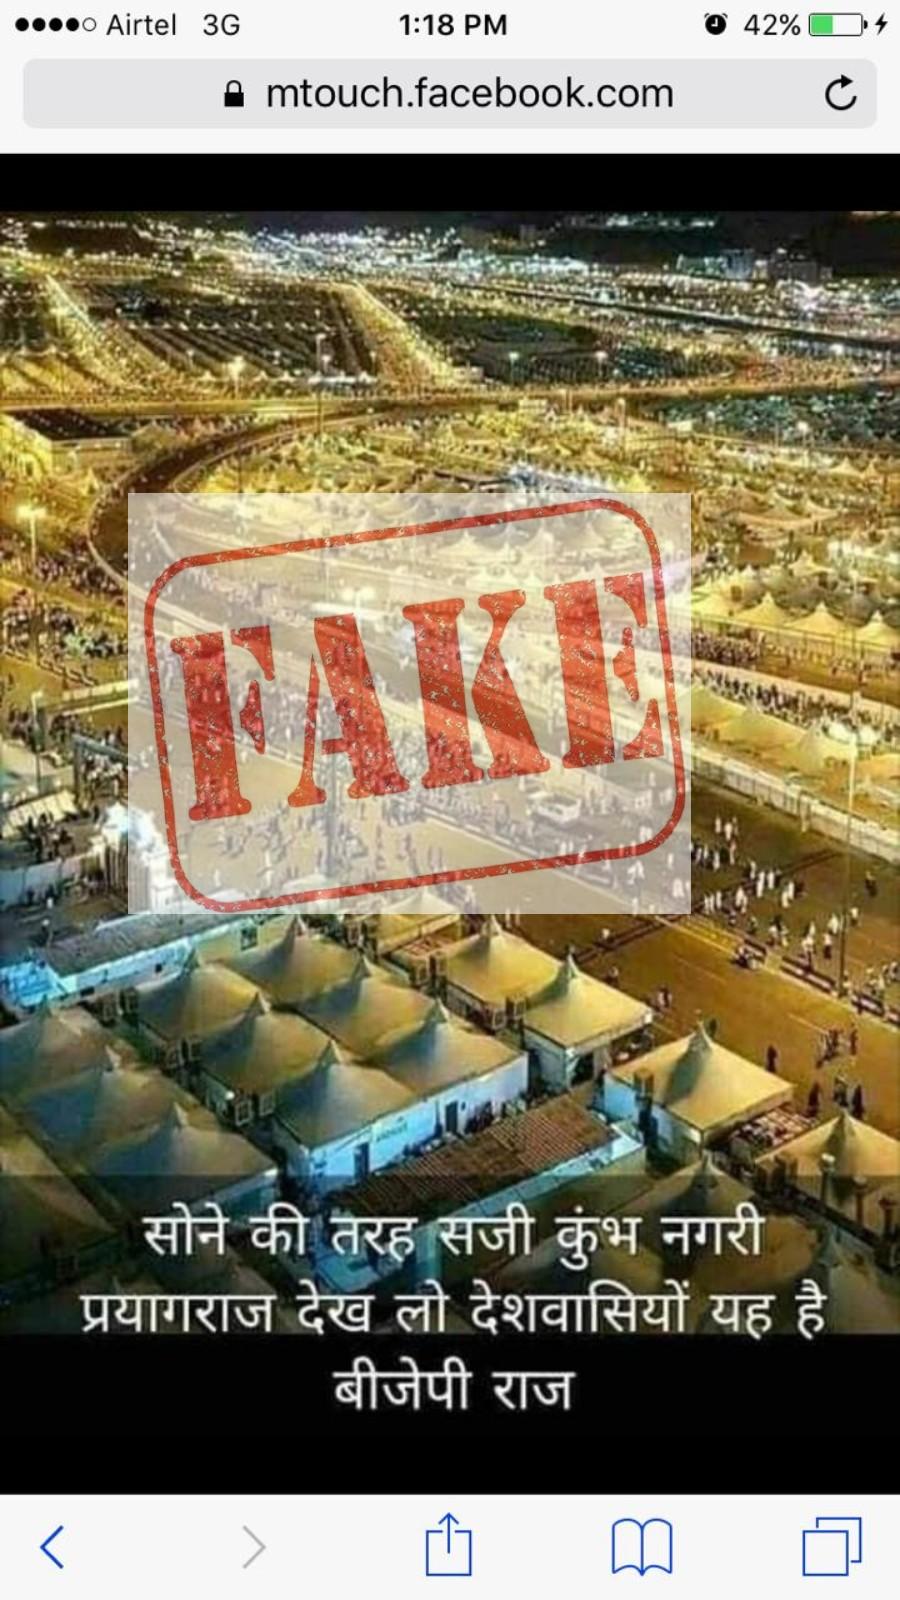 BJP supporters use Hajj photo from Mecca to flaunt 'golden Kumbh nagari' under 'BJP government'